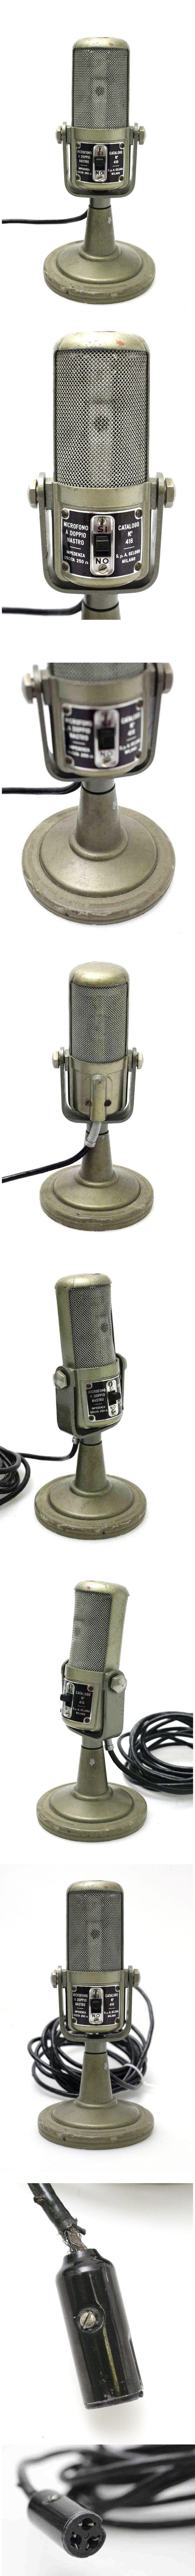 Used fisher xp speakers for sale hifishark - Geloso Sa Milano Microfono A Doppio Nastro 416 Mikrofon Vintage Hifi